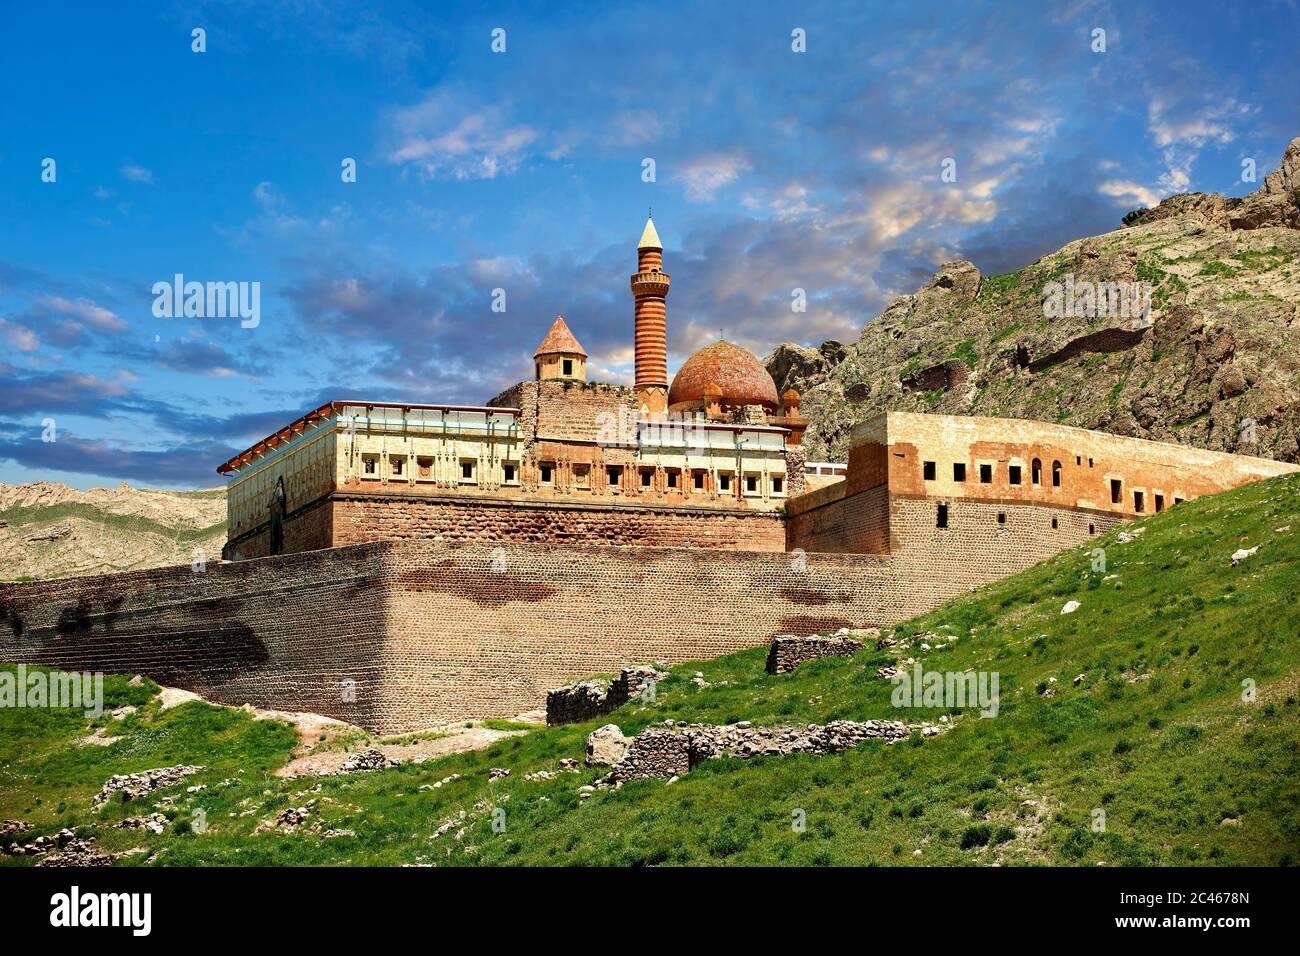 18th Century Ottoman architecture of the Ishak Pasha Palace (Turkish: İshak Paşa Sarayı) ,  Ağrı province of eastern Turkey. Stock Photo